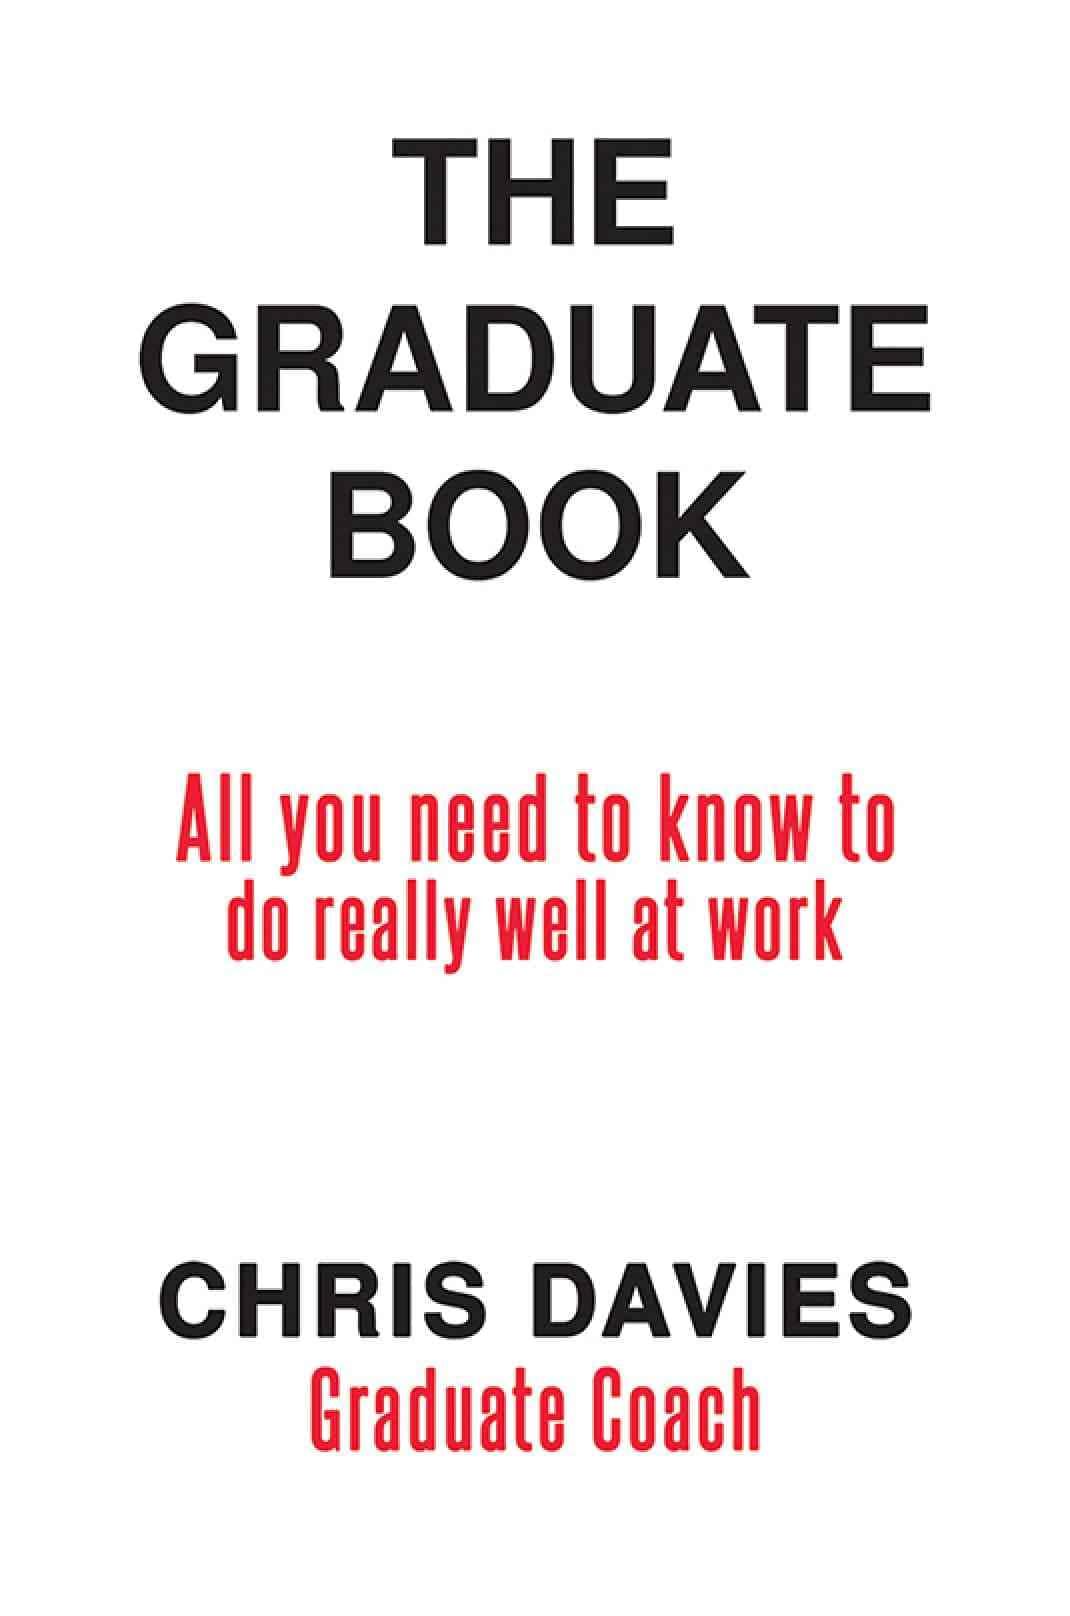 the graduate book book austin macauley publishers